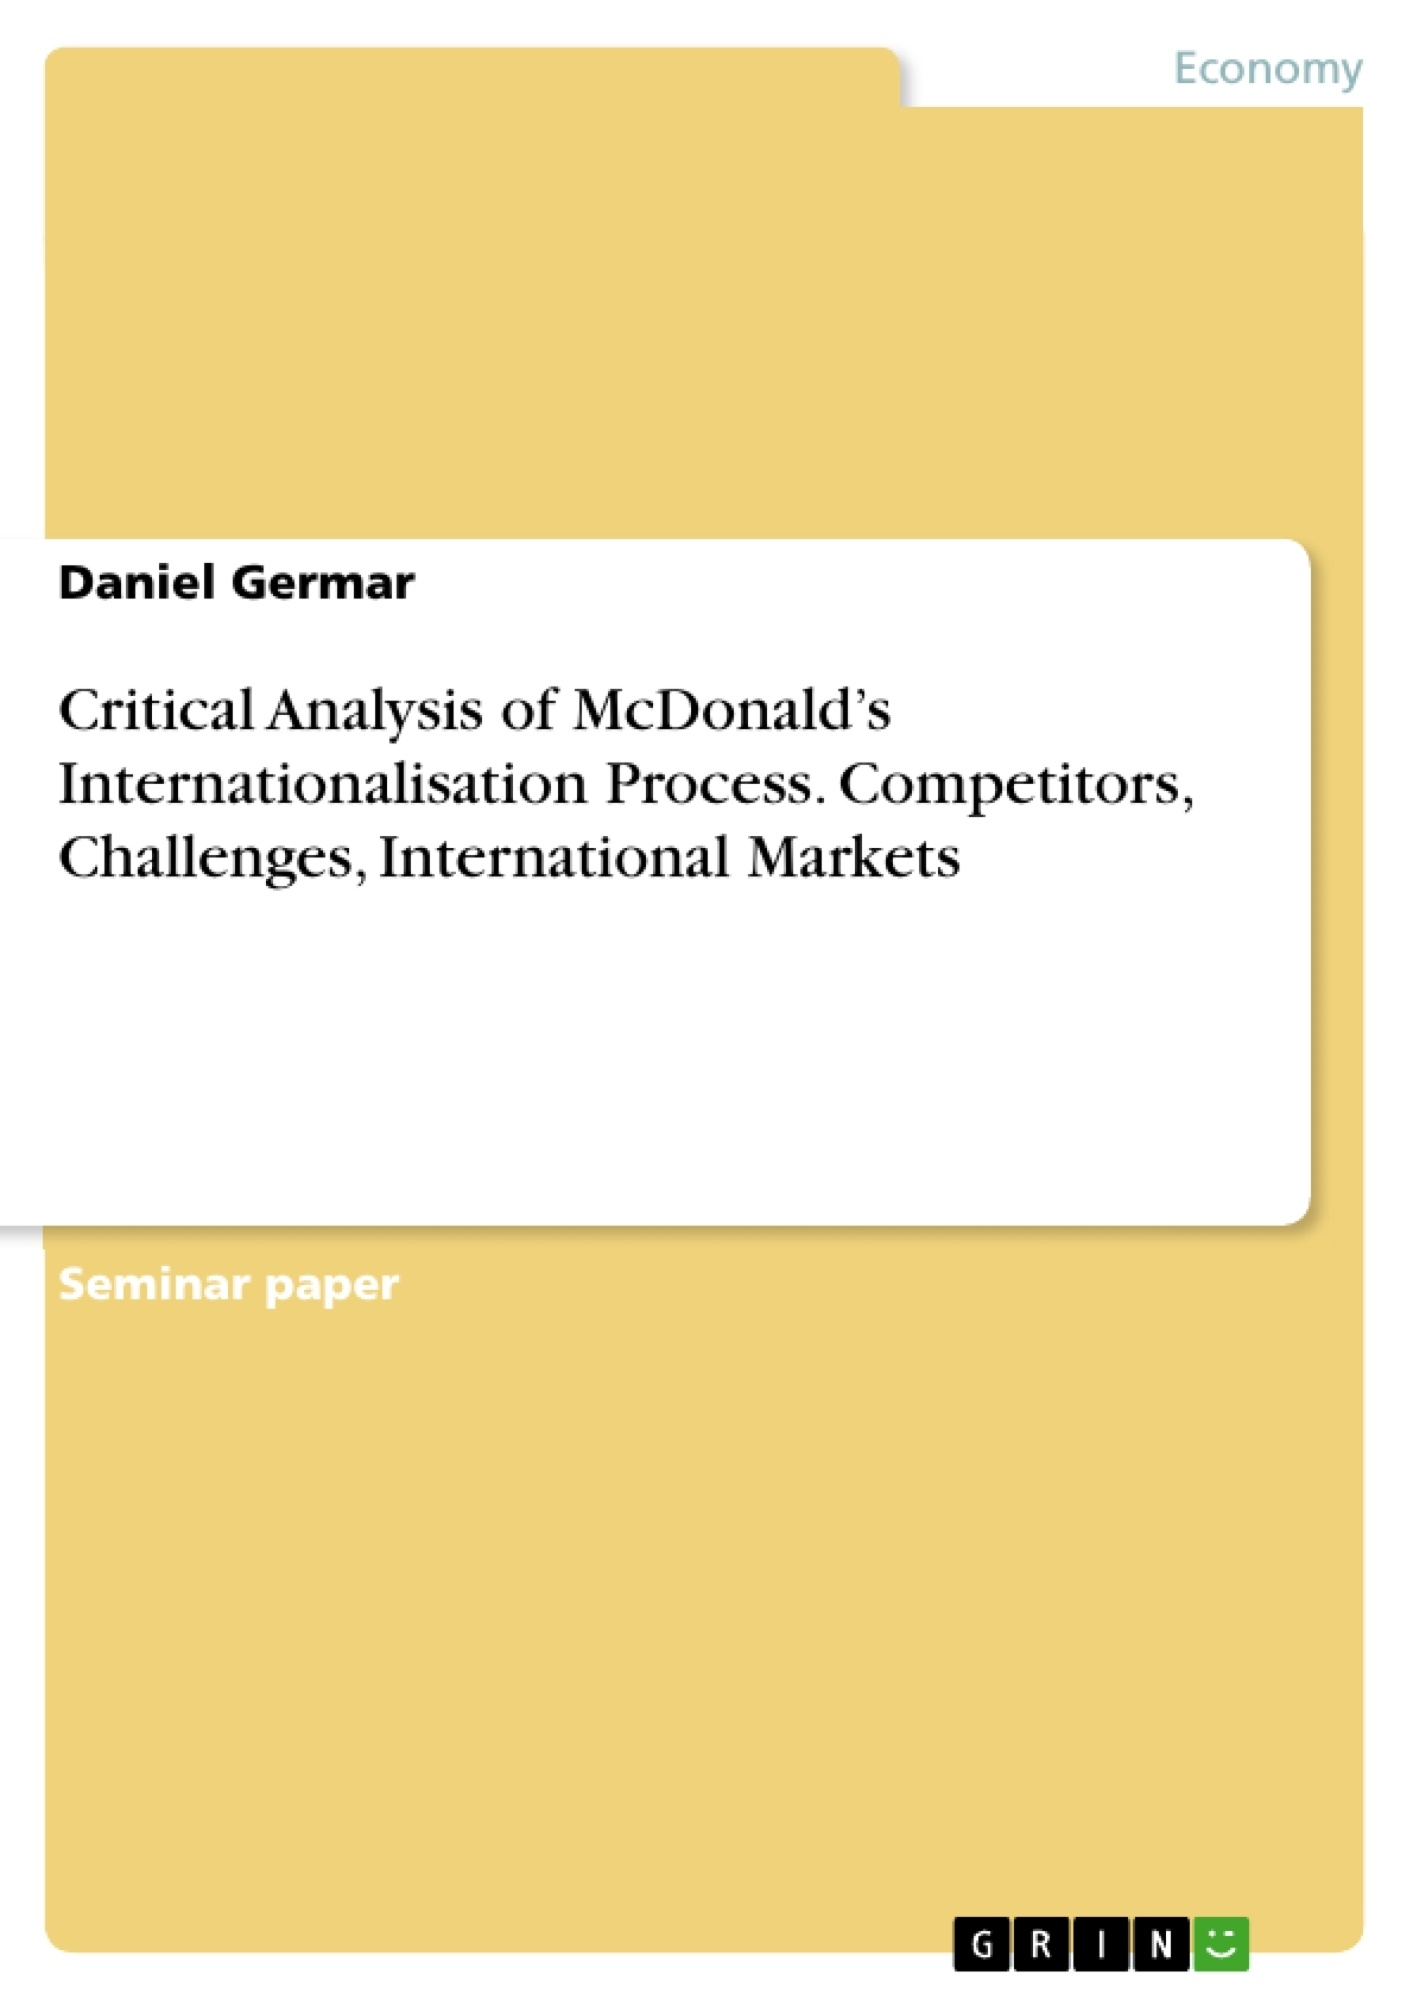 Title: Critical Analysis of McDonald's Internationalisation Process. Competitors, Challenges, International Markets